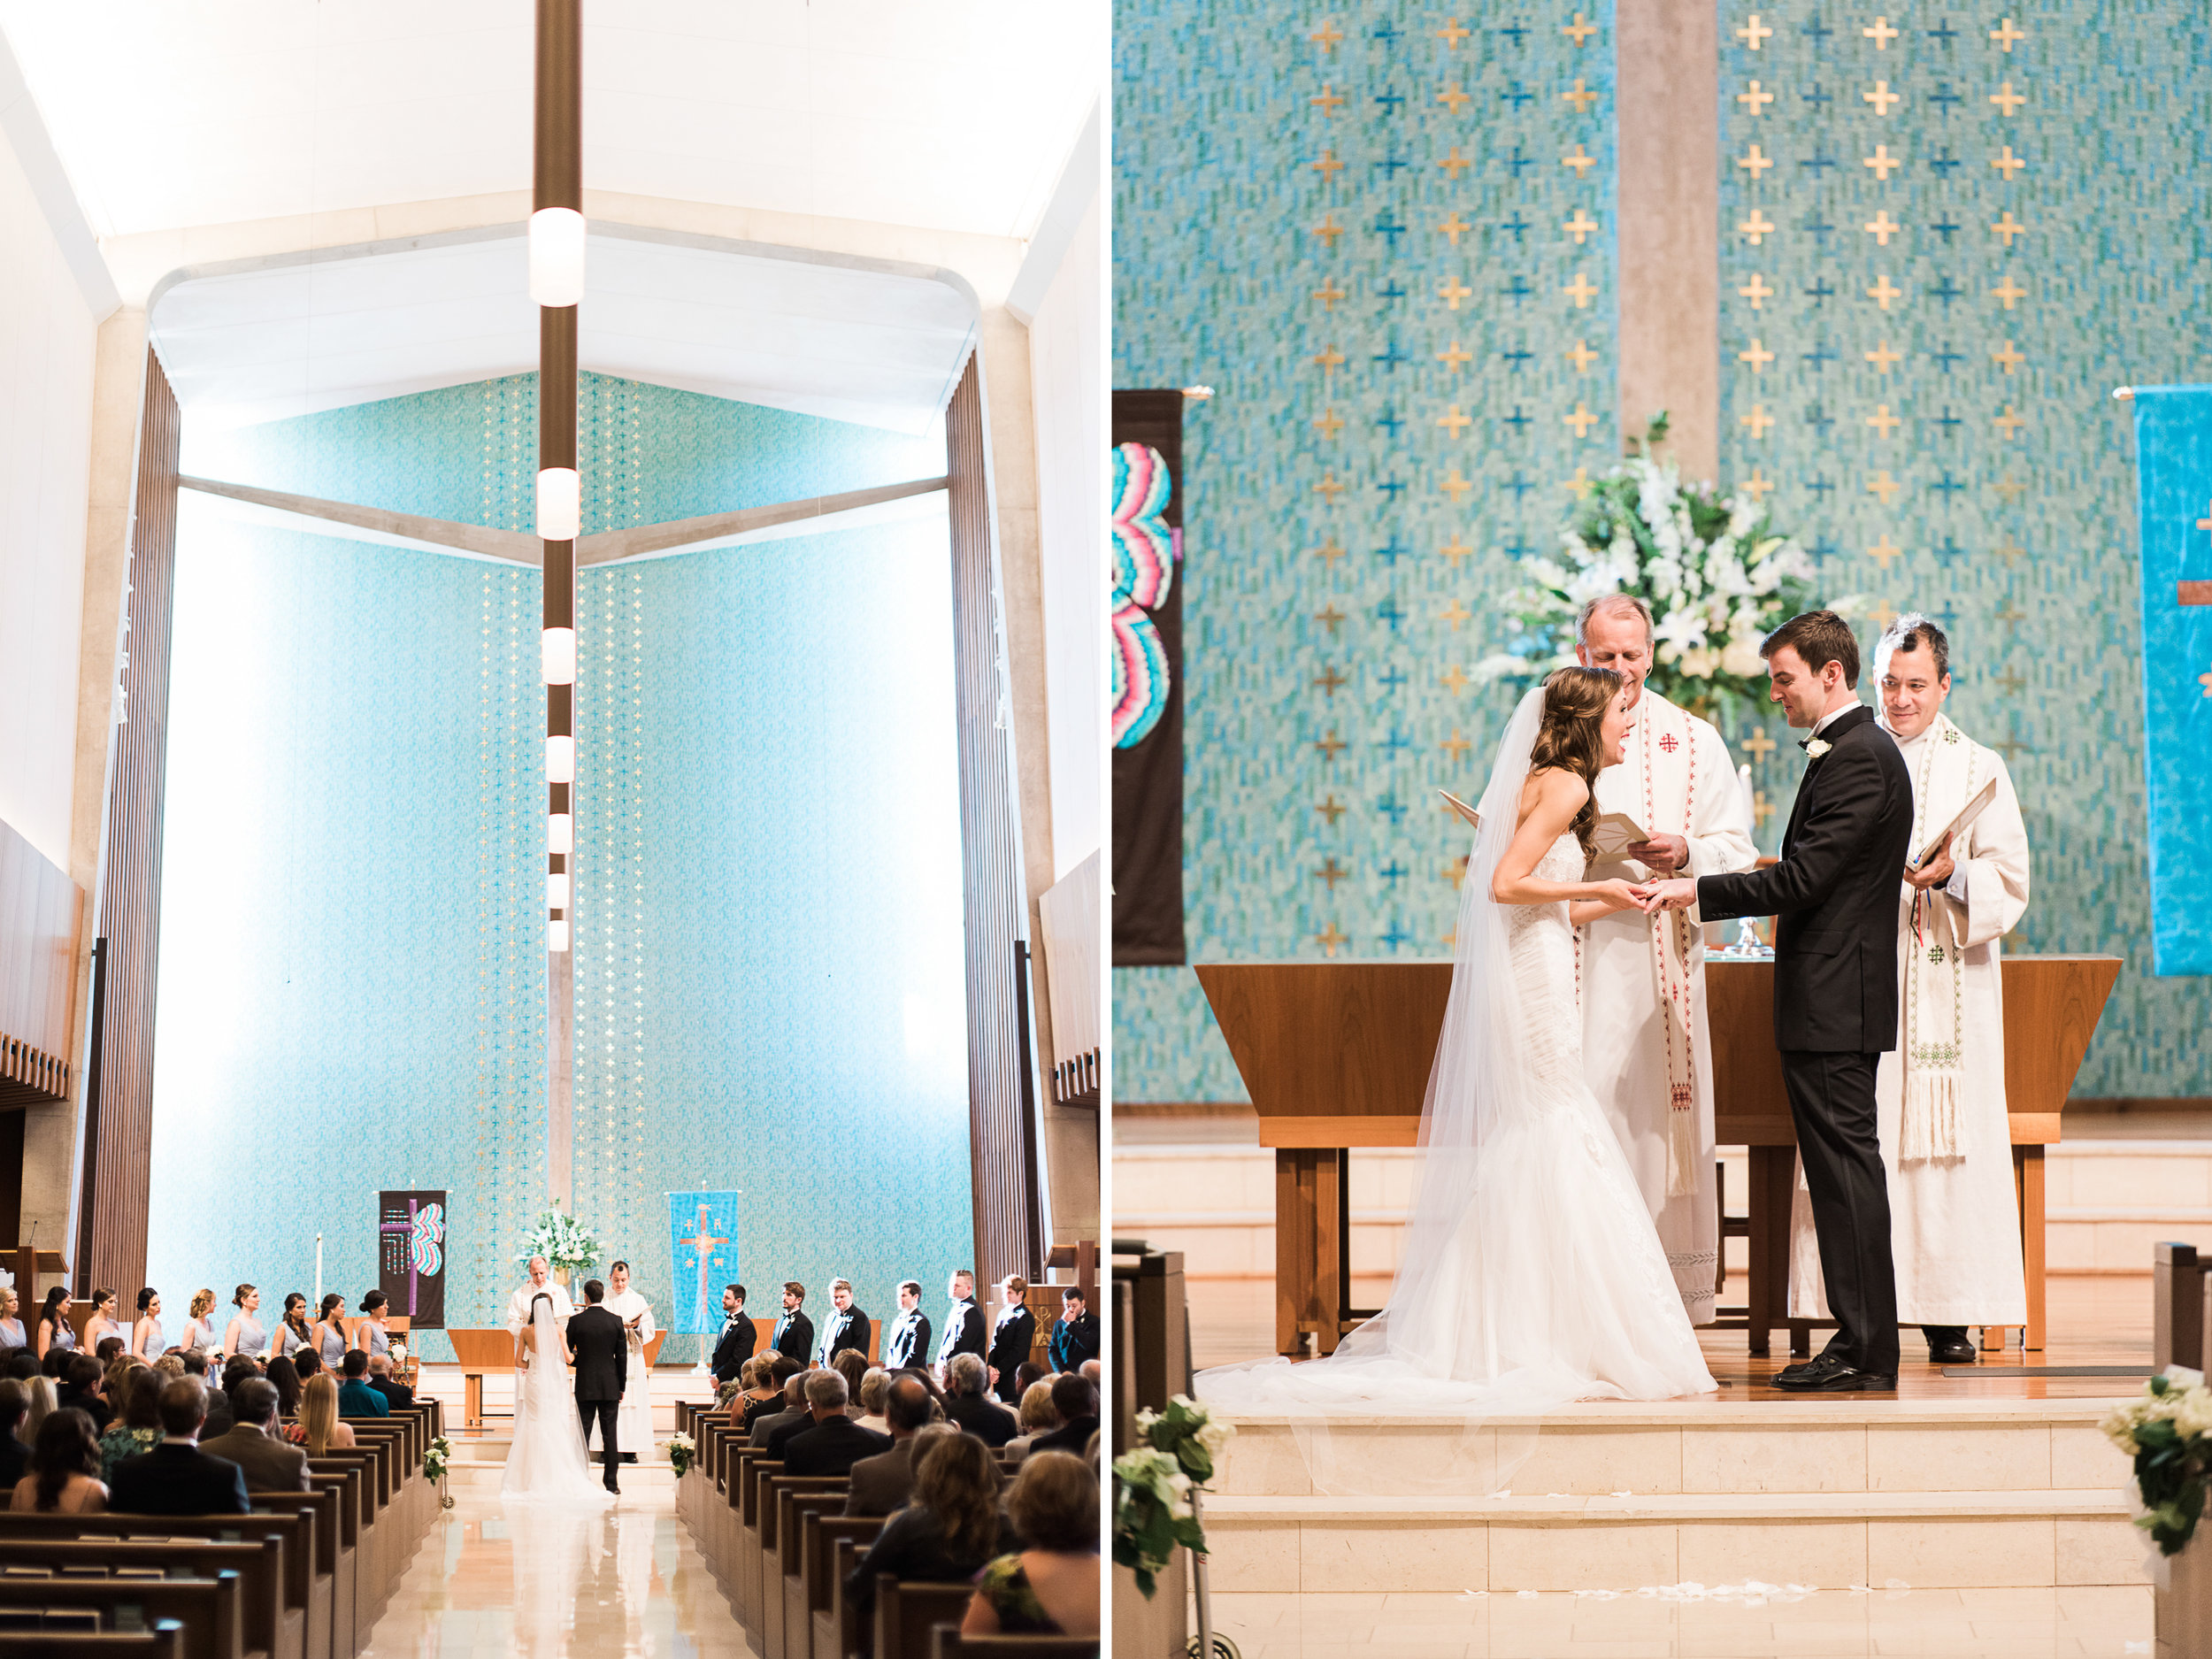 St.-Philip-Presbyterian-Church-Houston-Wedding-Ceremony-The-Junior-League-Of-Houston-Reception-Dana-Fernandez-Photography-Fine-Art-Film-131.jpg